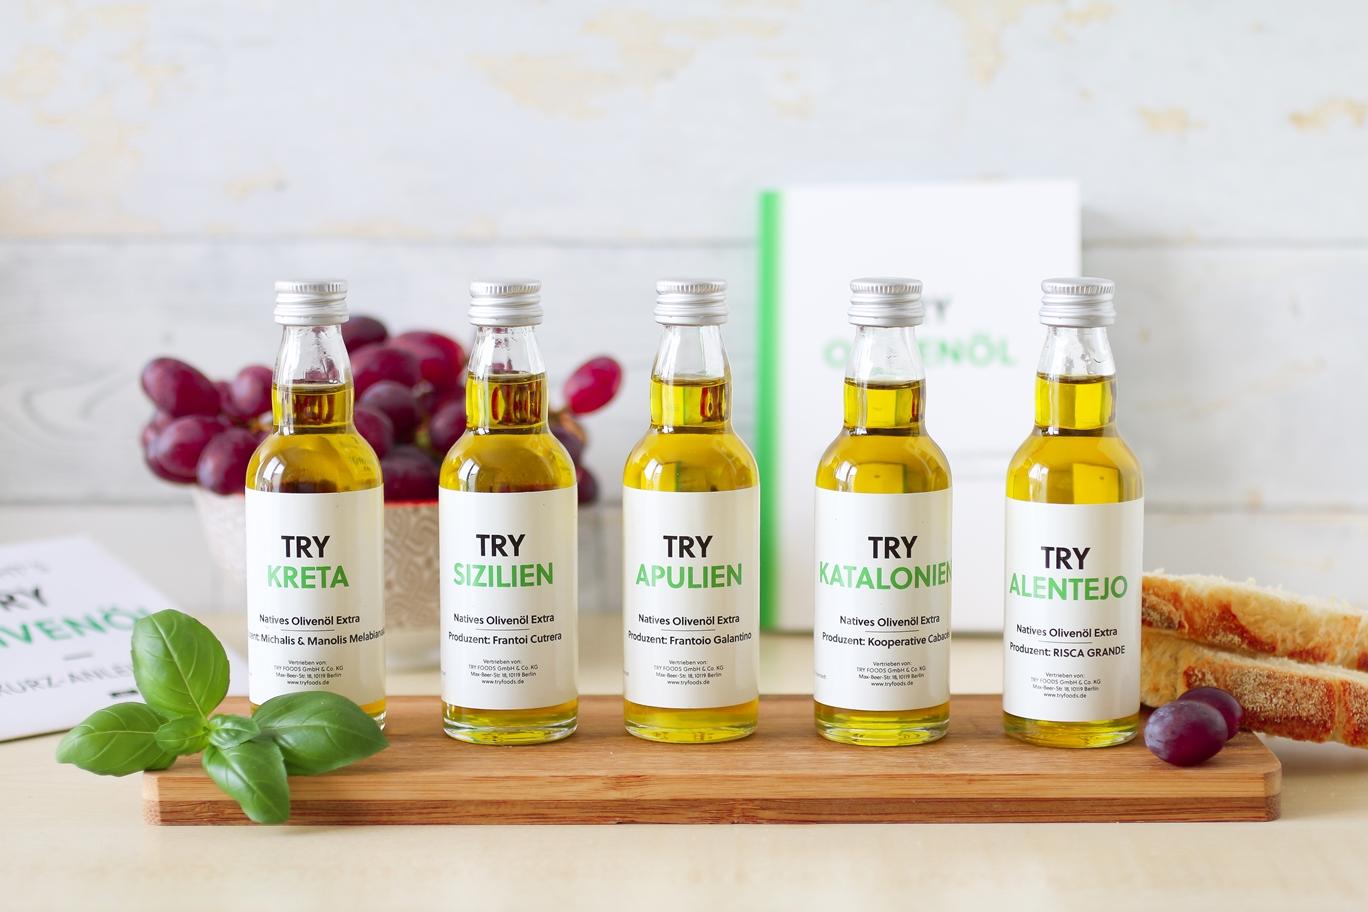 TRY Foods – großes Olivenöl Tasting mit der Probierbox